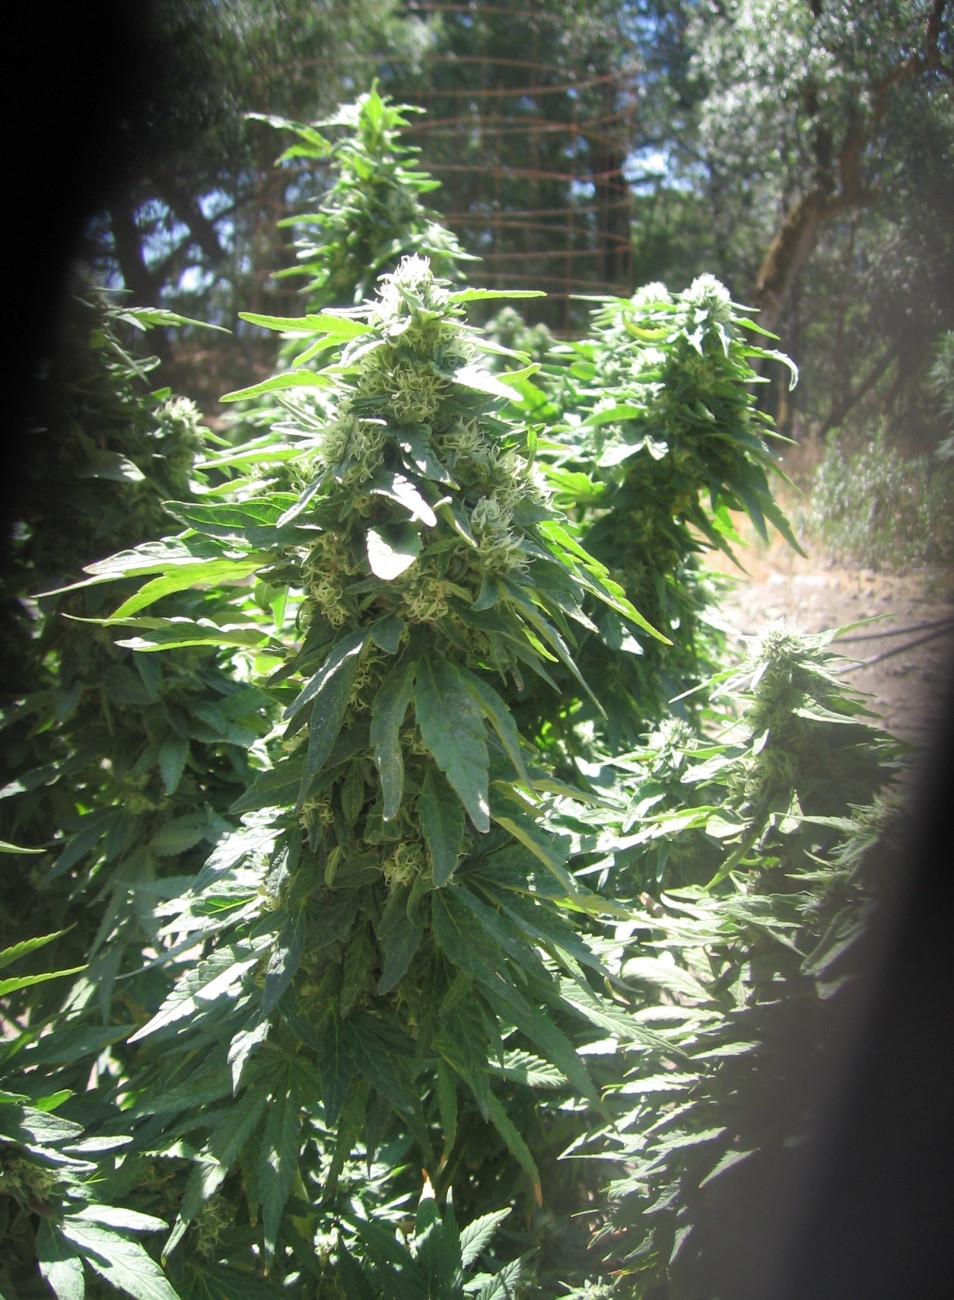 California marijuana laws HS 11357 to 11362.5, 11479